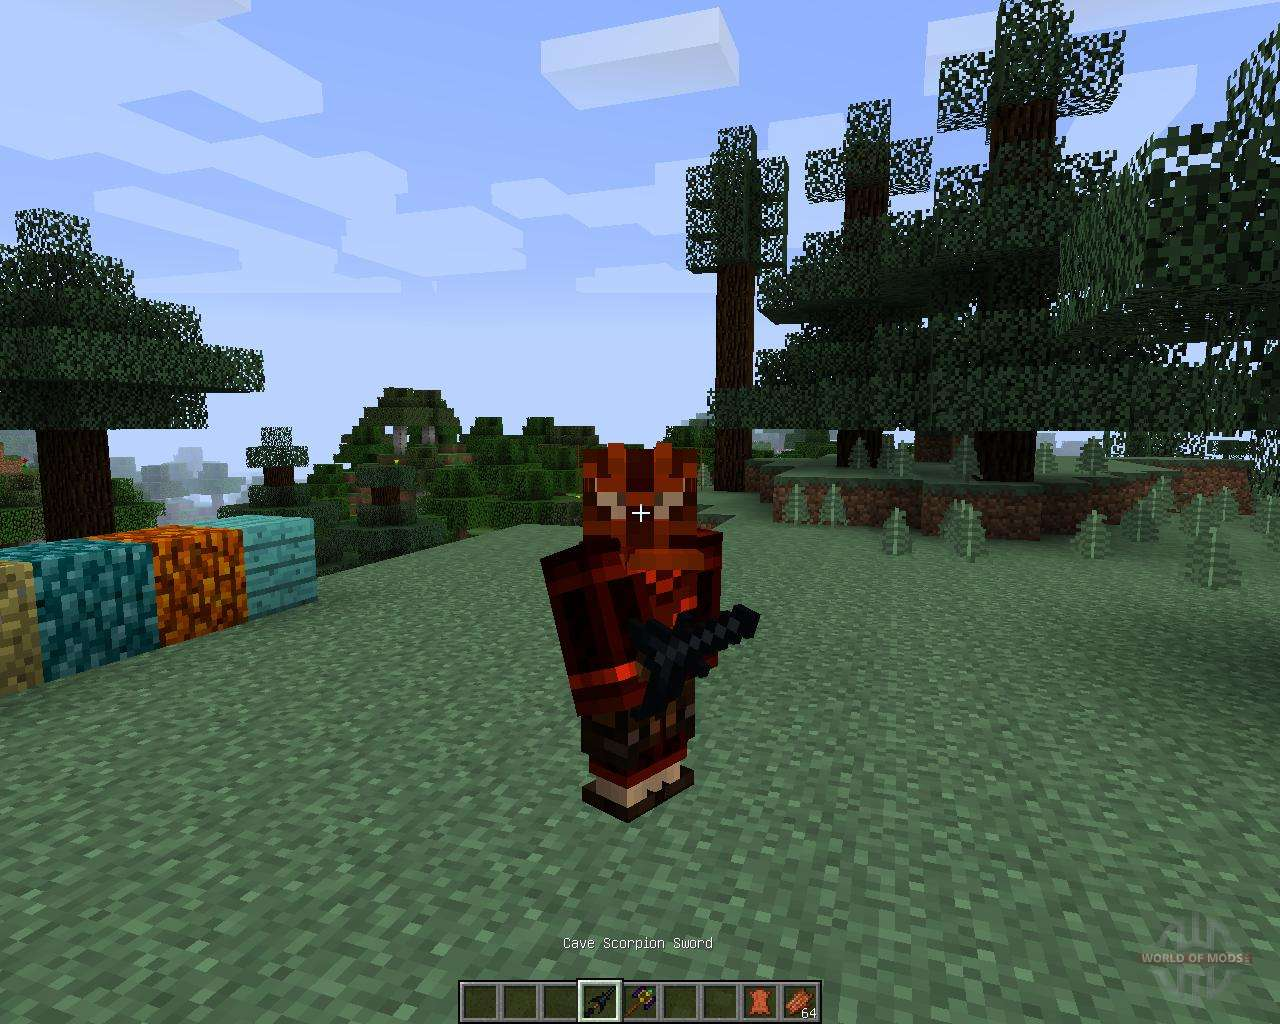 мод майнкрафт 1.7.10 mo creatures v6.2.0